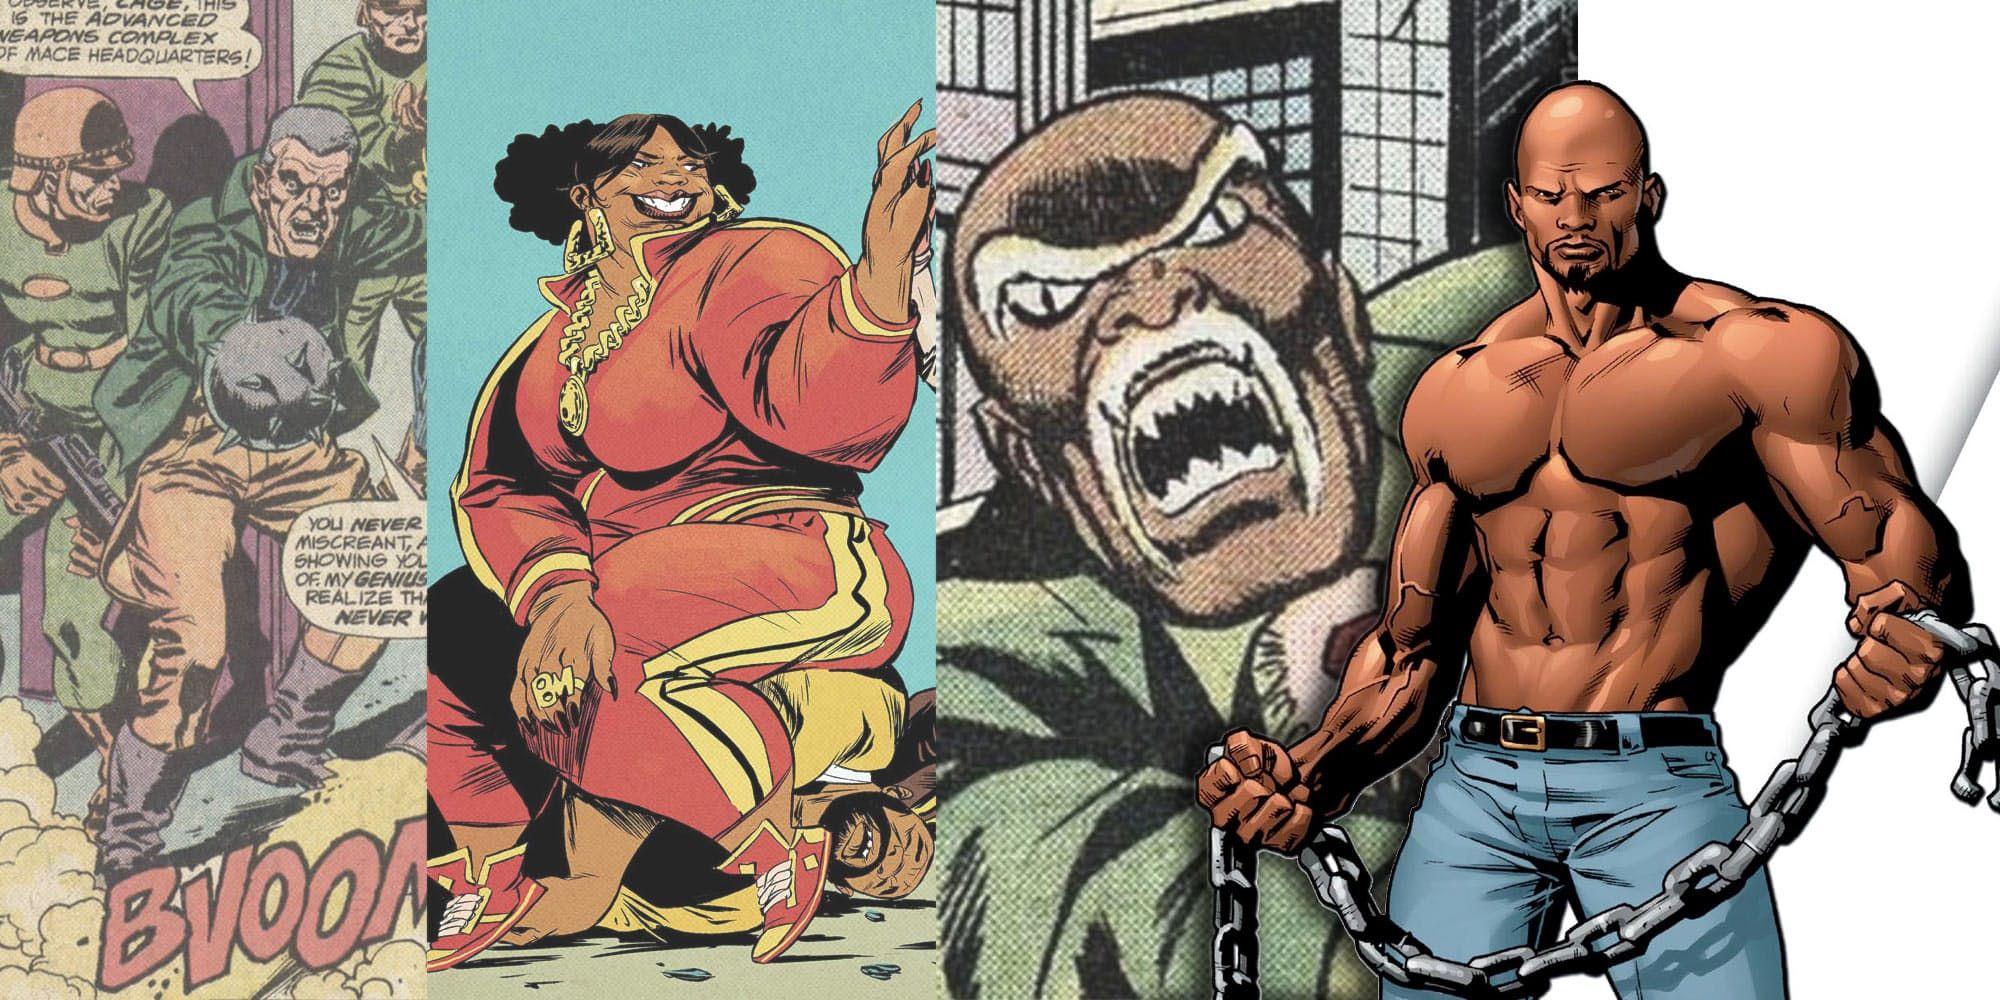 Pin by James Richardson on Black Superheroes Luke cage